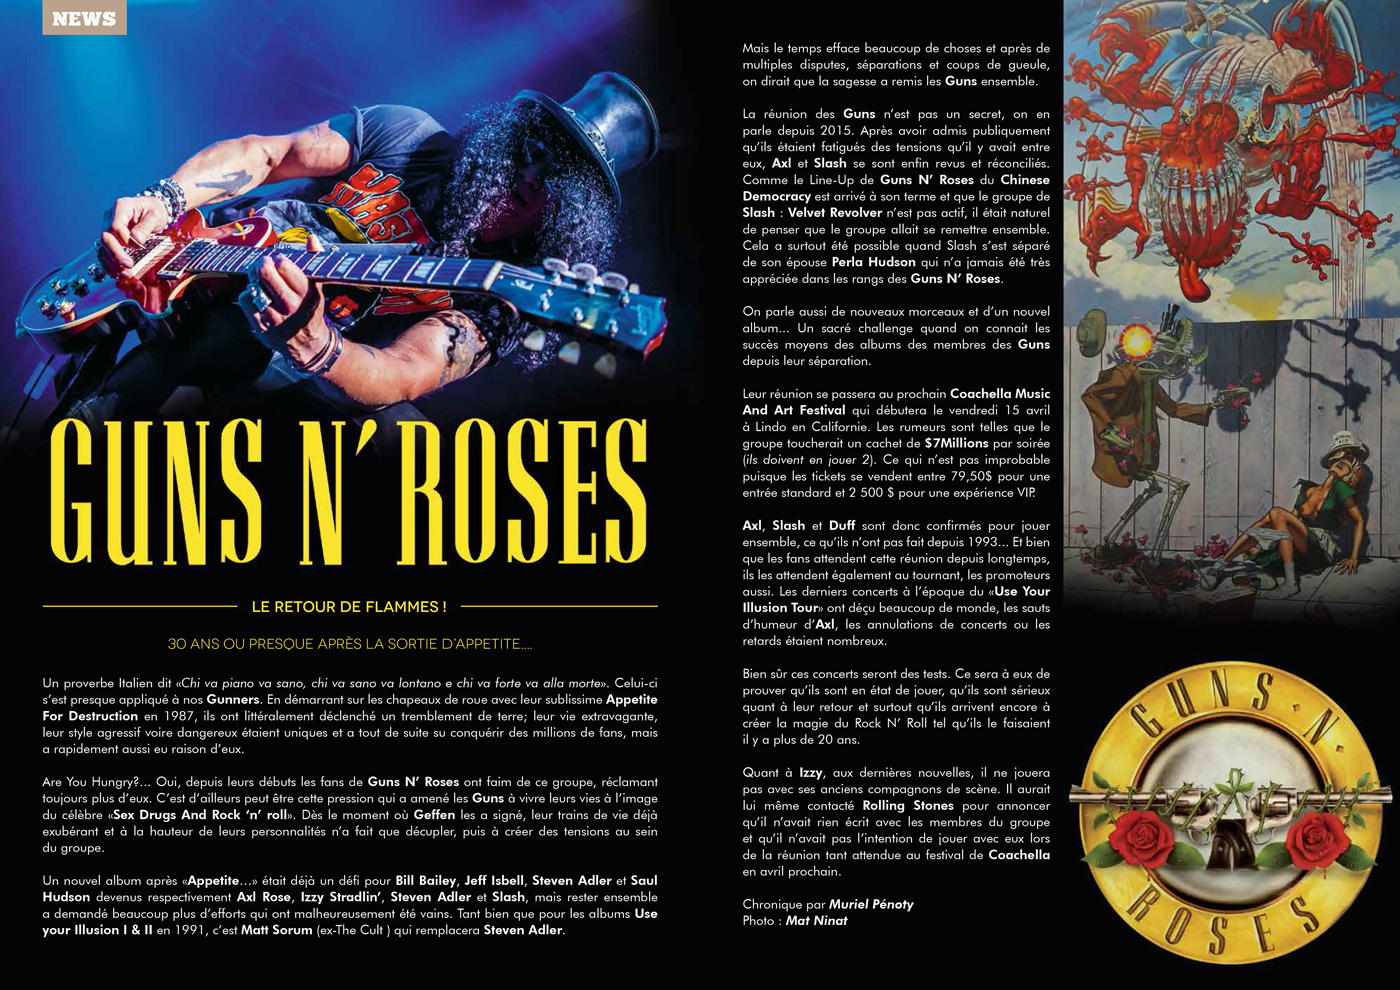 TV ROCK LIVE 9 | article | Slash photo by Mat Ninat